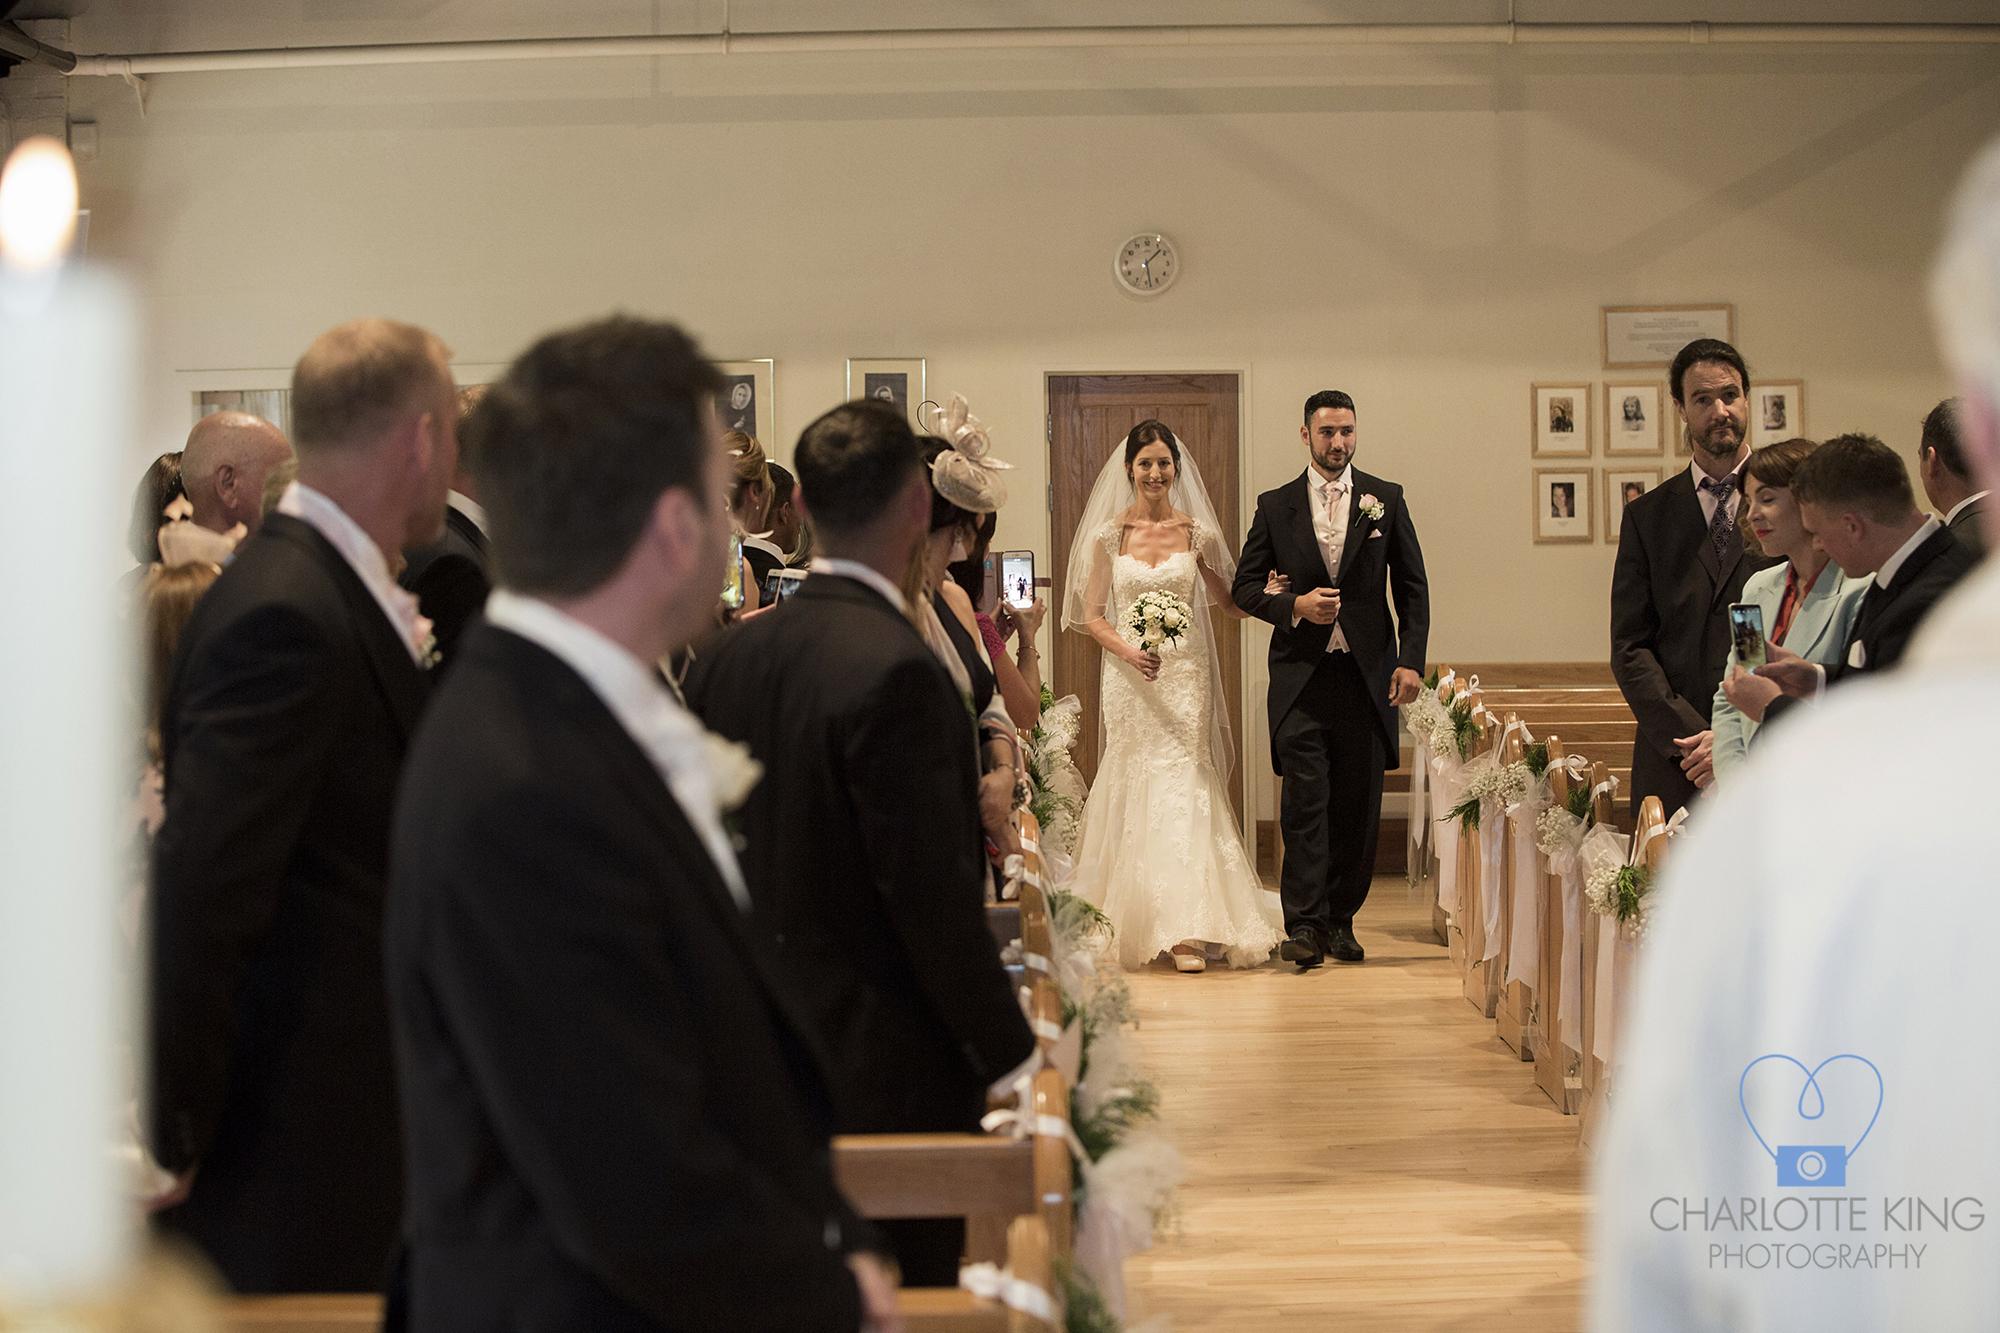 Woldingham-school-wedding-charlotte-king-photography (43)